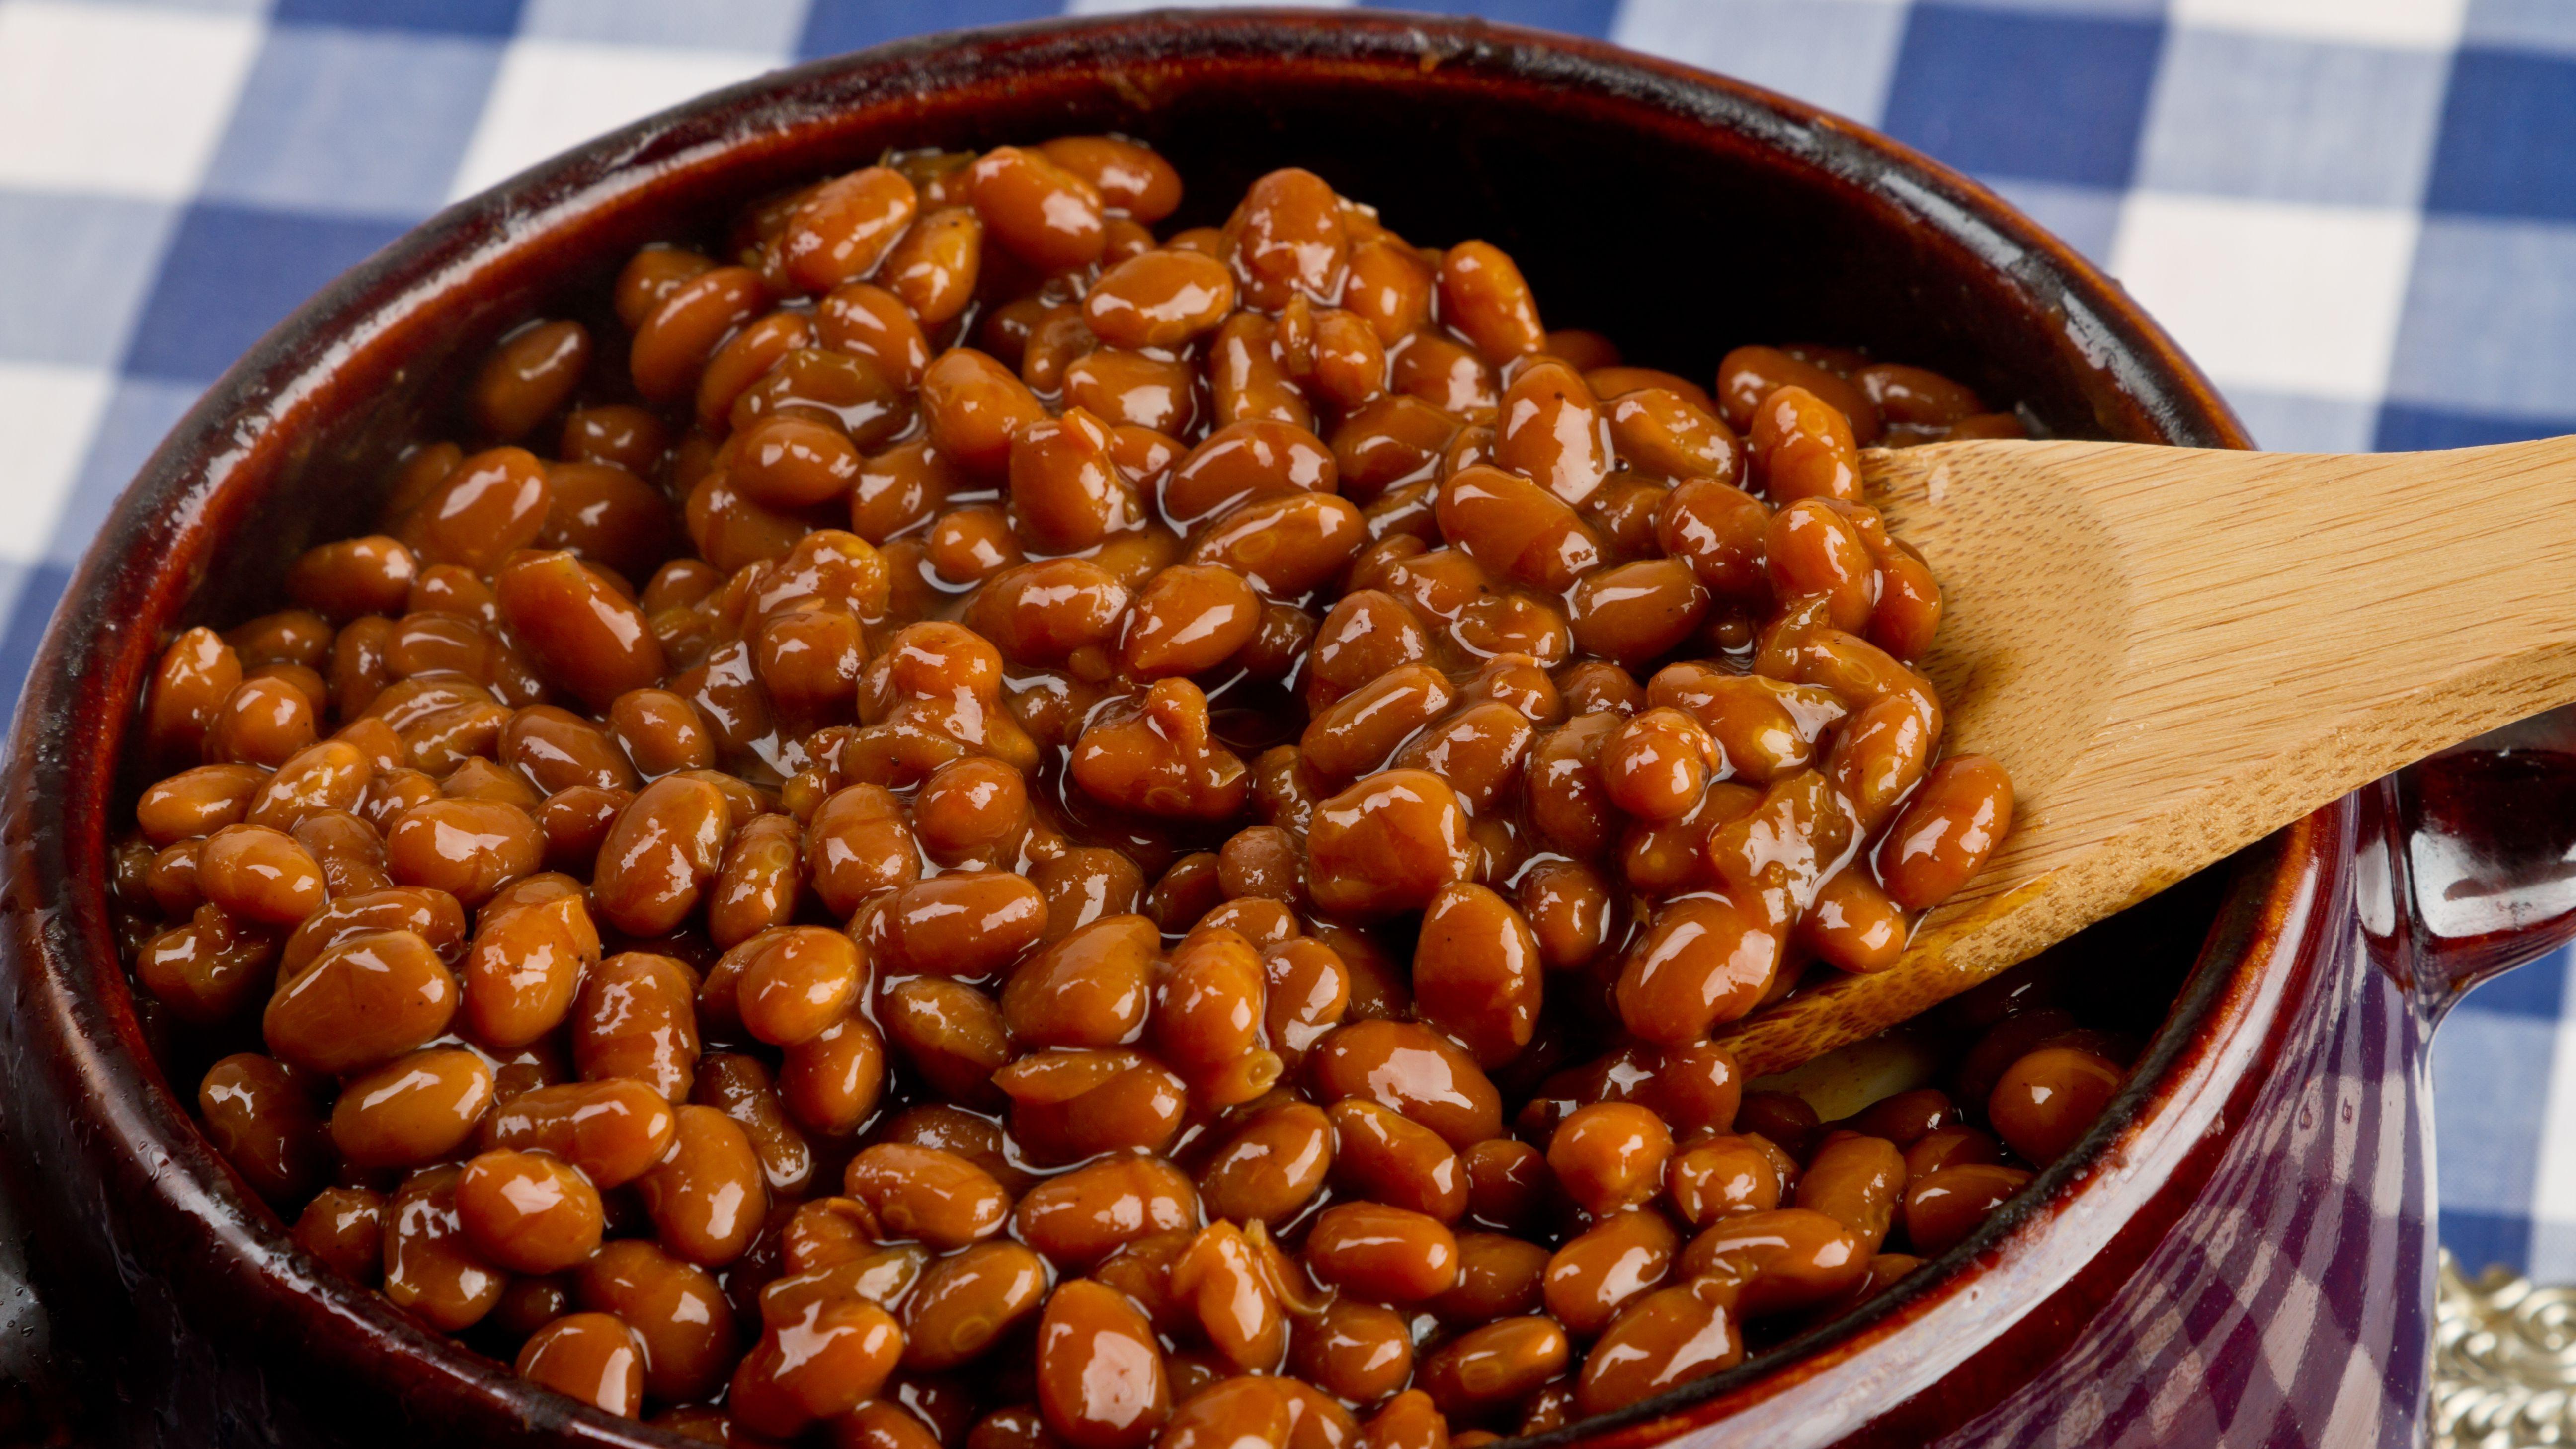 Crockpot Baked Beans Recipe